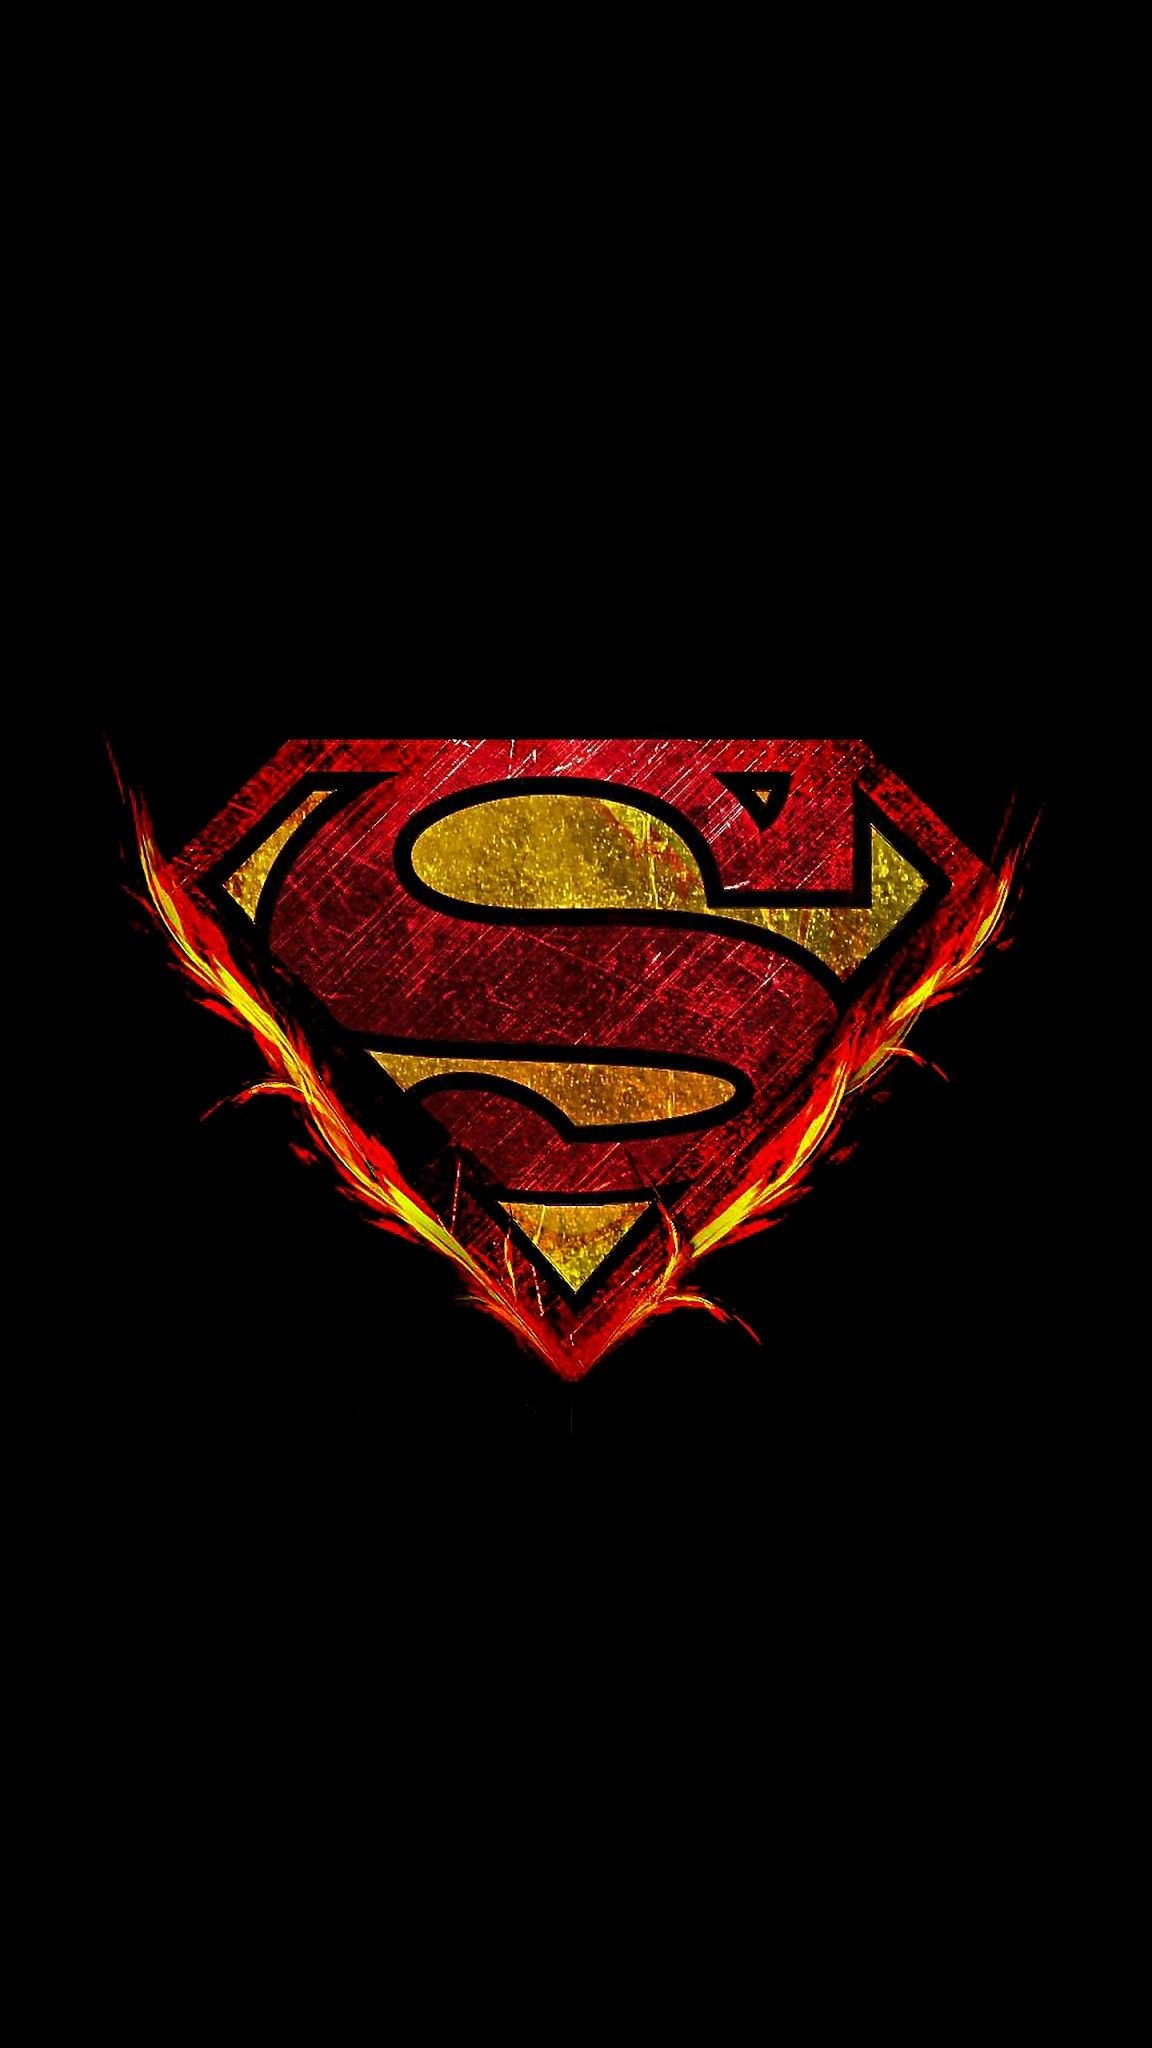 Pin de Ricardo A. Rojas L. en Superman  cebc6179981